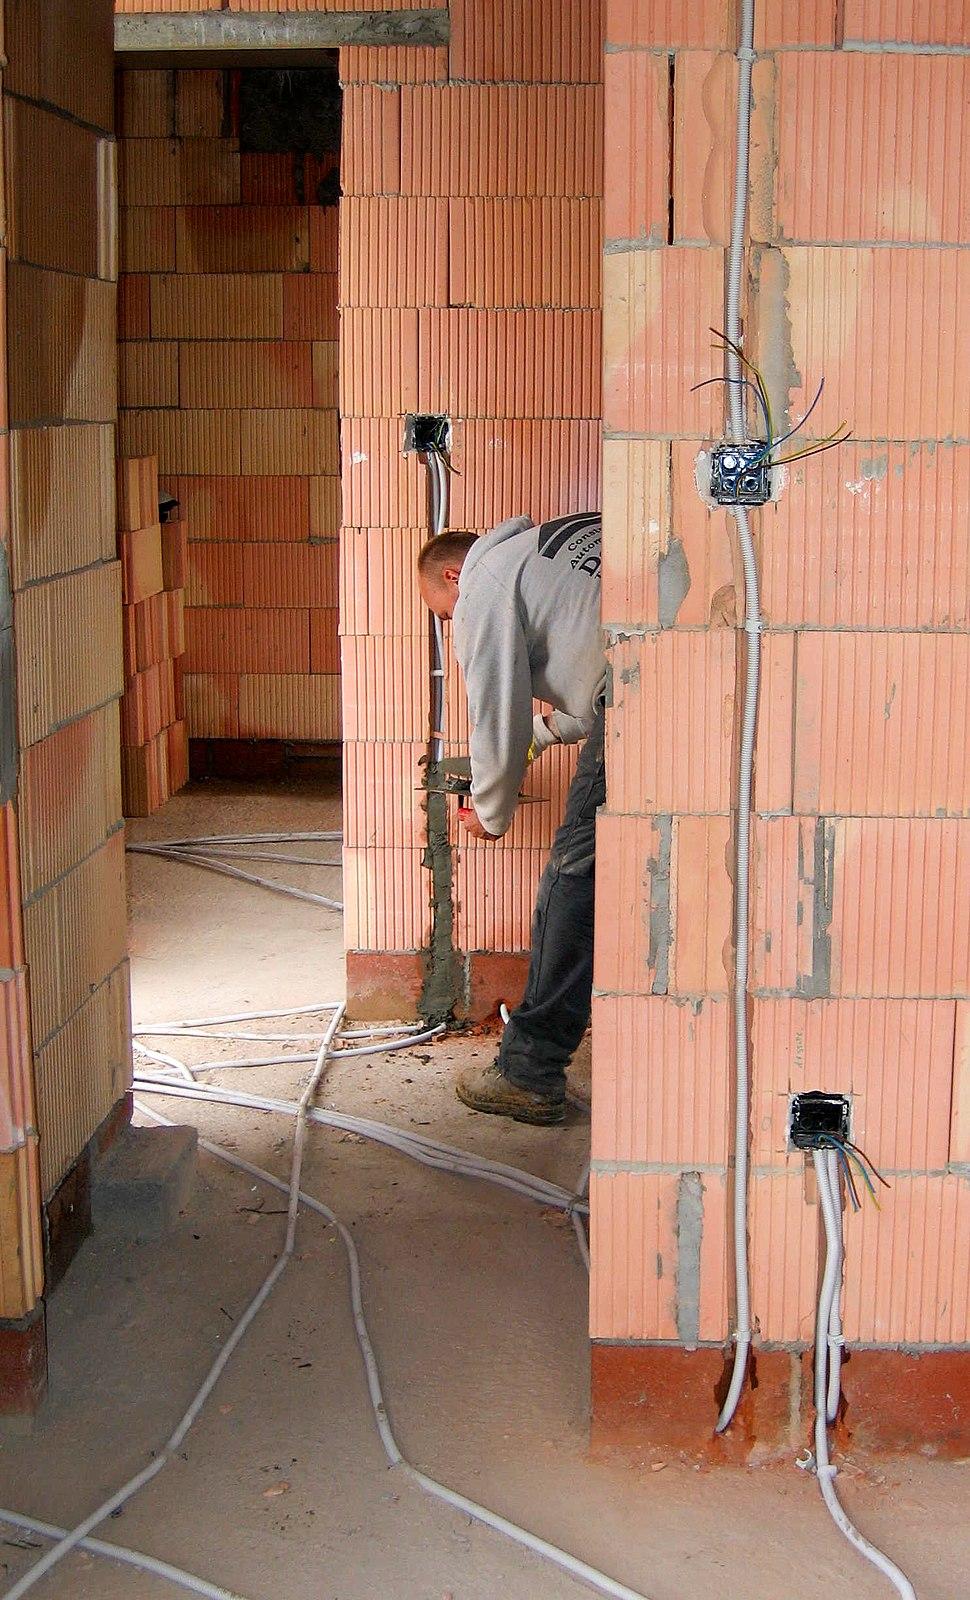 Installing electrical wiring